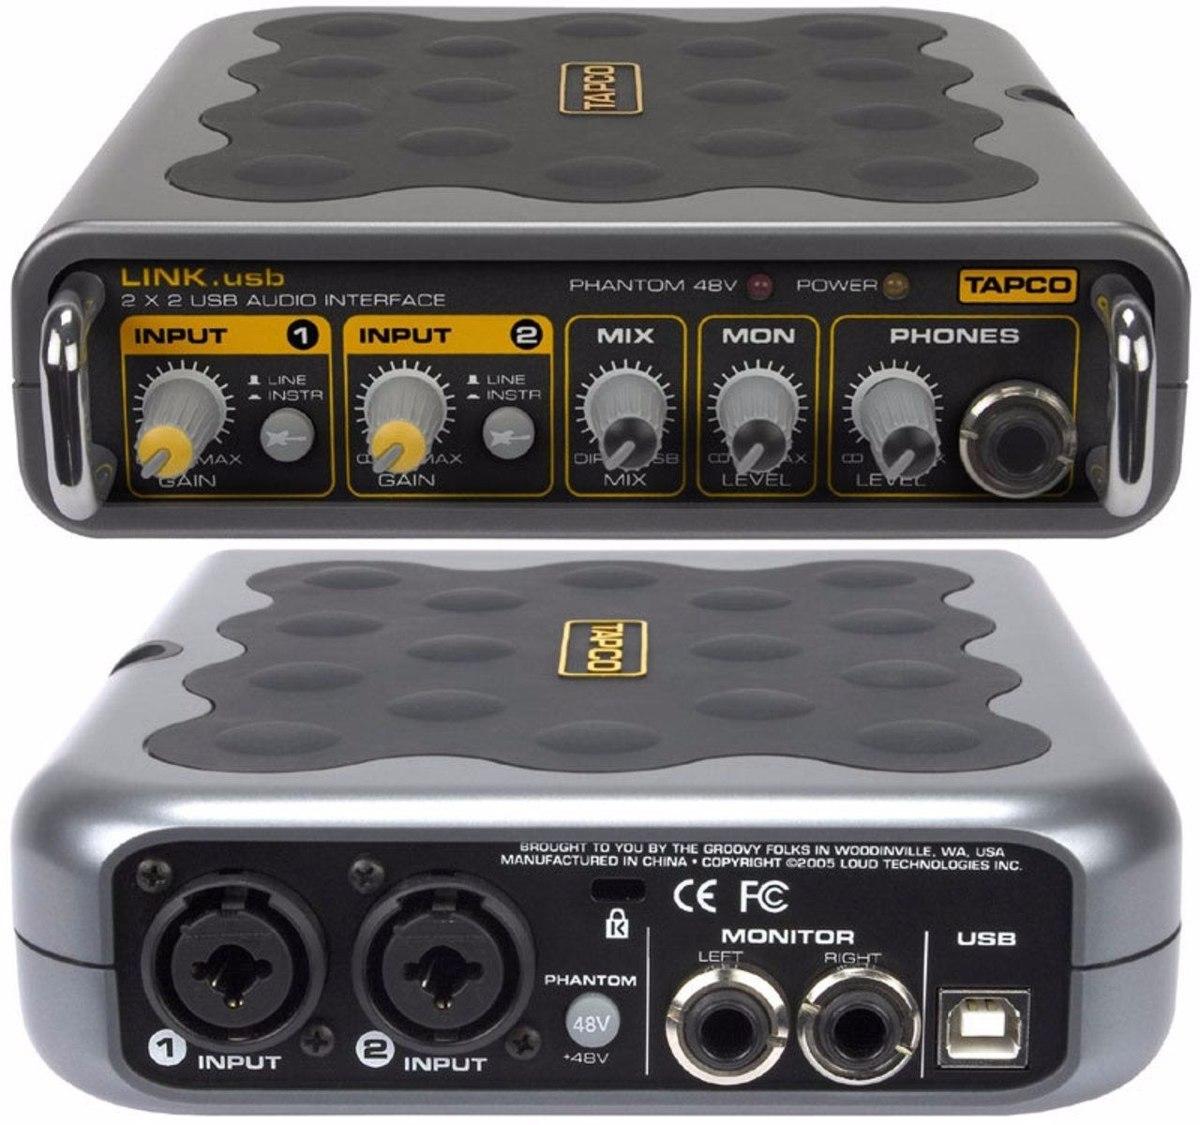 interface-de-audio-mackie-tapco-link-usb-nueva-sin-caja-ofer-D_NQ_NP_973401-MCO20313890400_062015-F.jpg